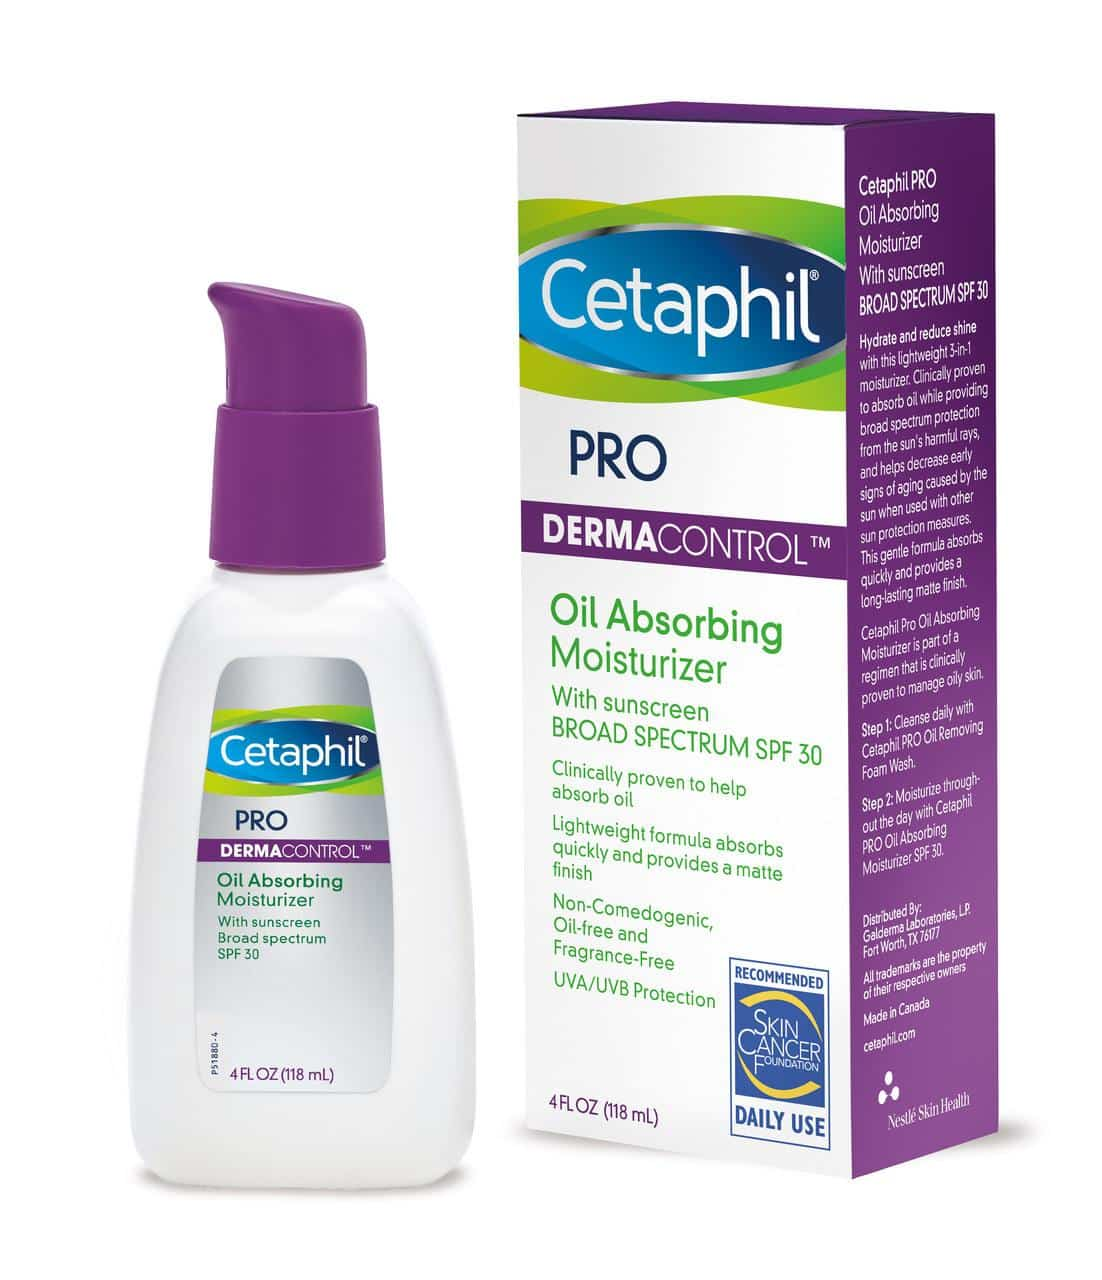 Cetaphil-DermaControl-Oil-Absorbing-Moisturizer-SPF-30